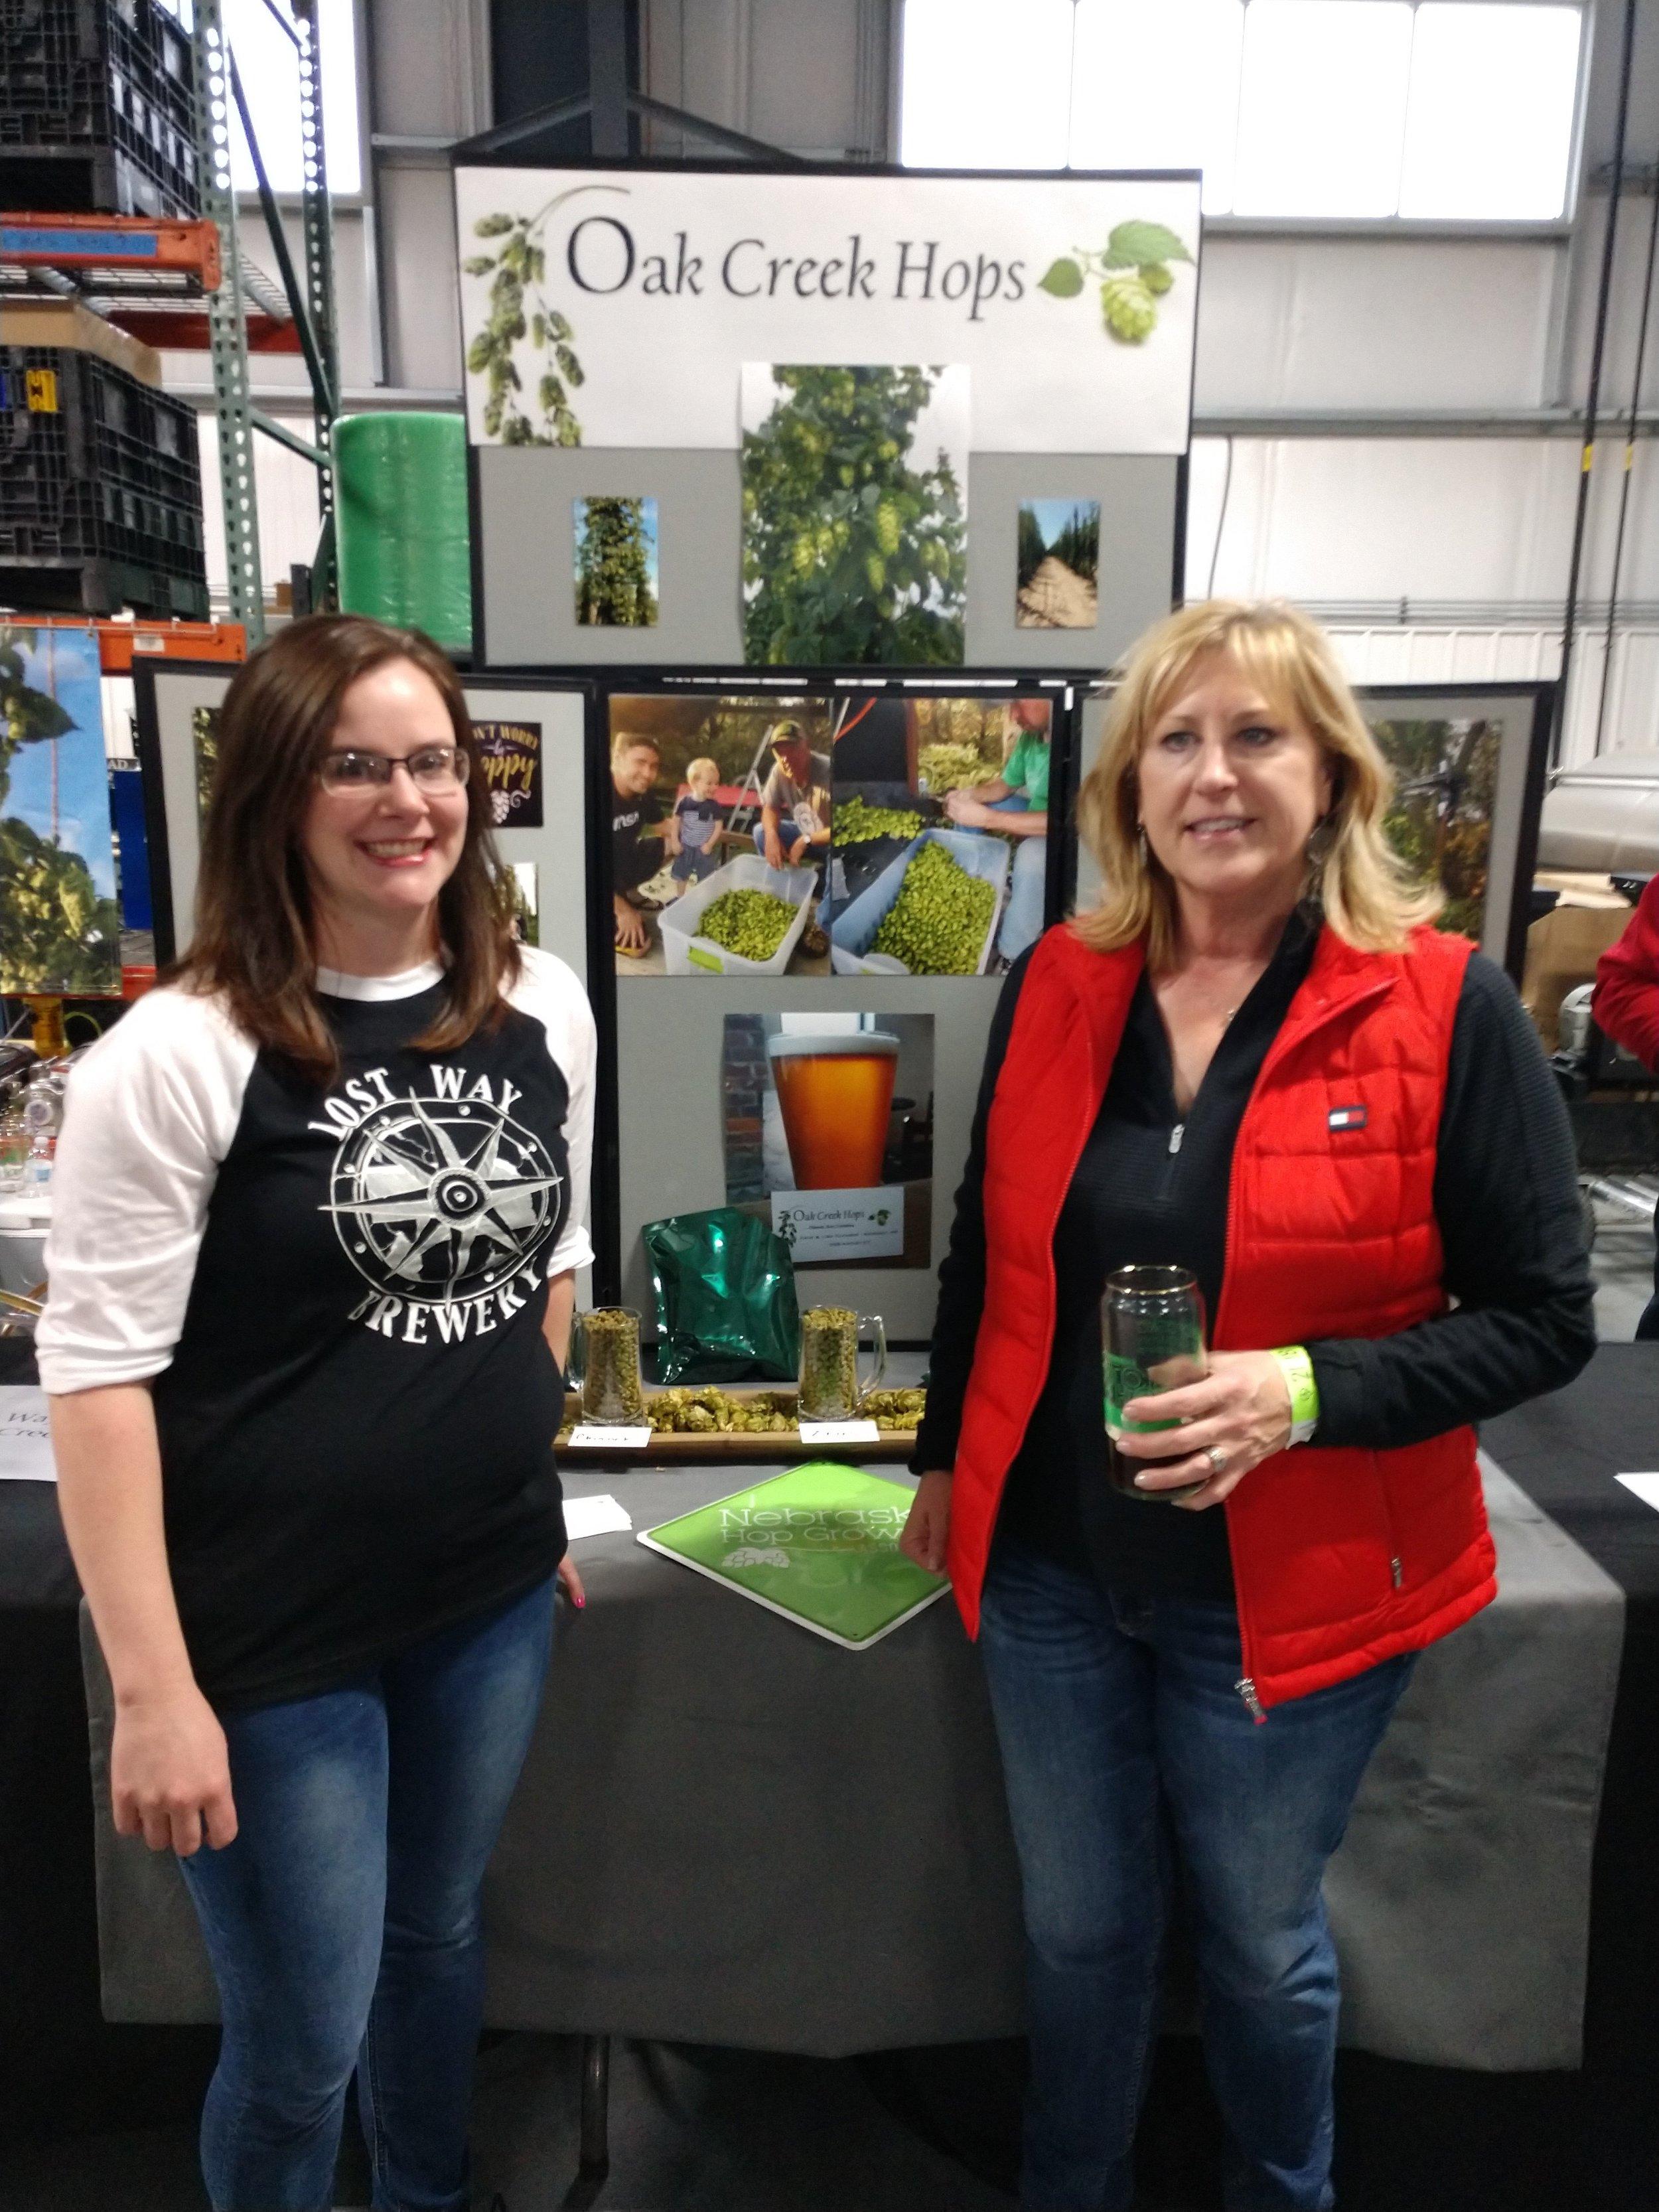 2018 Top Hop - Kimberly Hines (Lost Way Brewery, Holdrege, NE) & Lisa Gleason